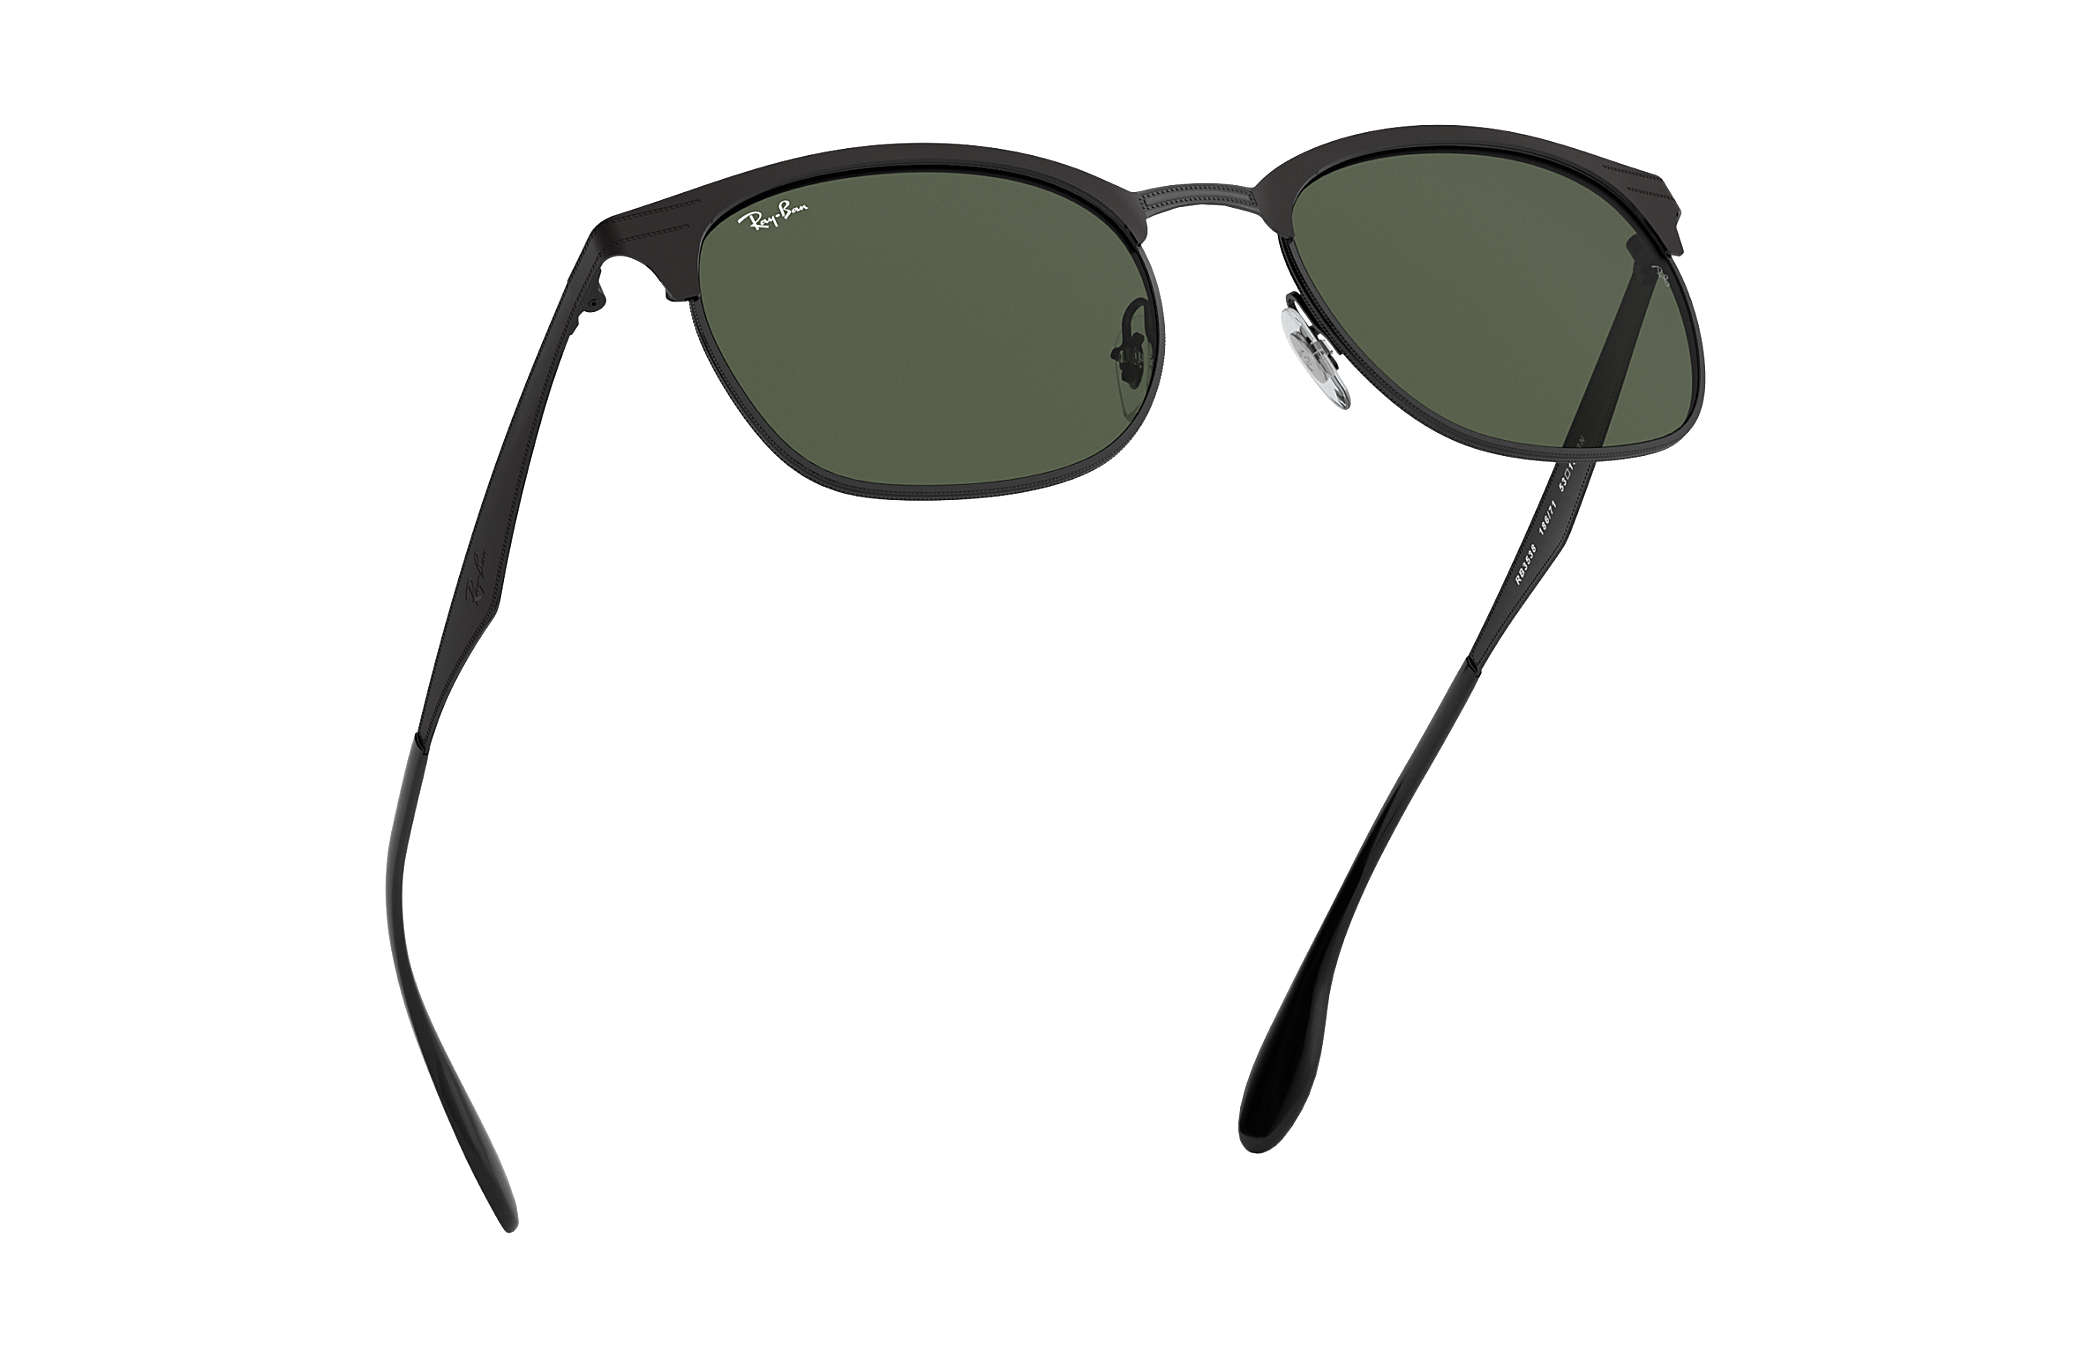 6d42a2971 Ray-Ban RB3538 Black - Metal - Green Lenses - 0RB3538186/7153 | Ray ...